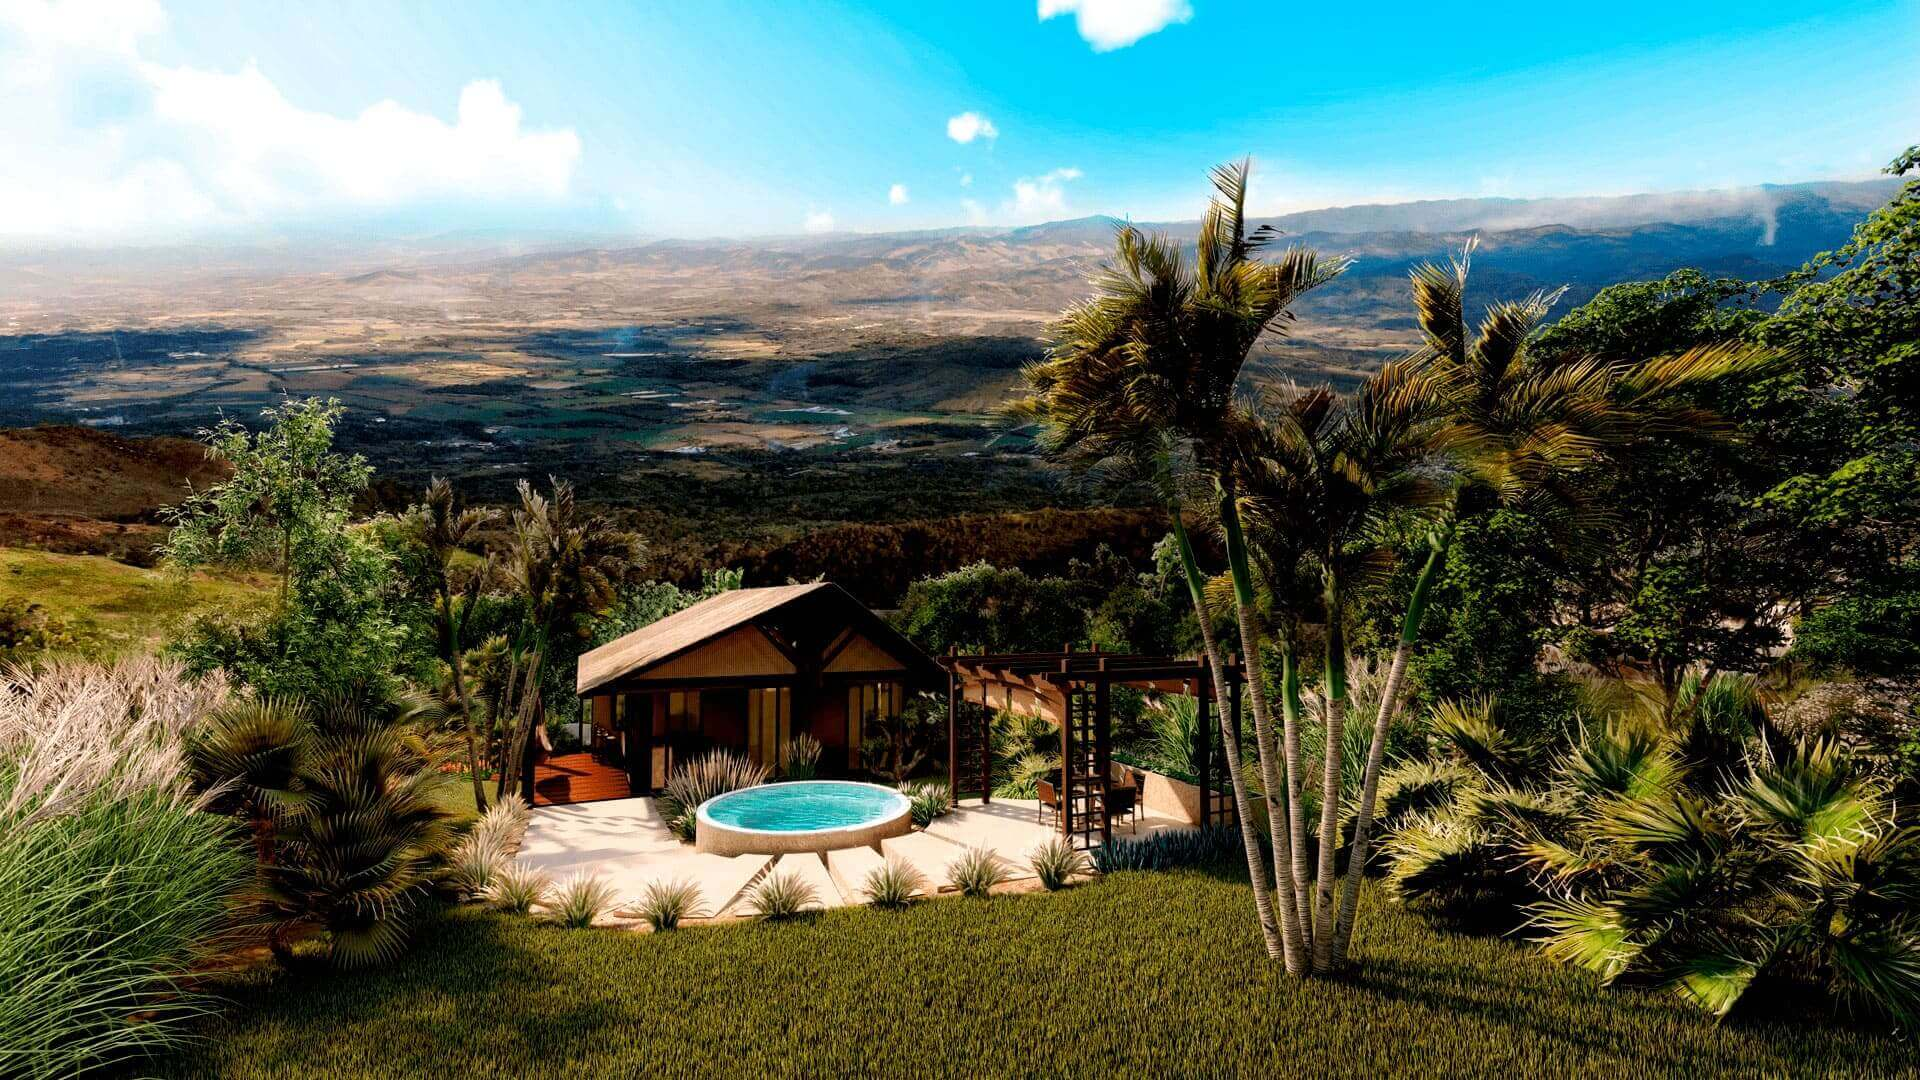 Vista aérea de casa modular con piscina en Yanashpa Village, Tarapoto